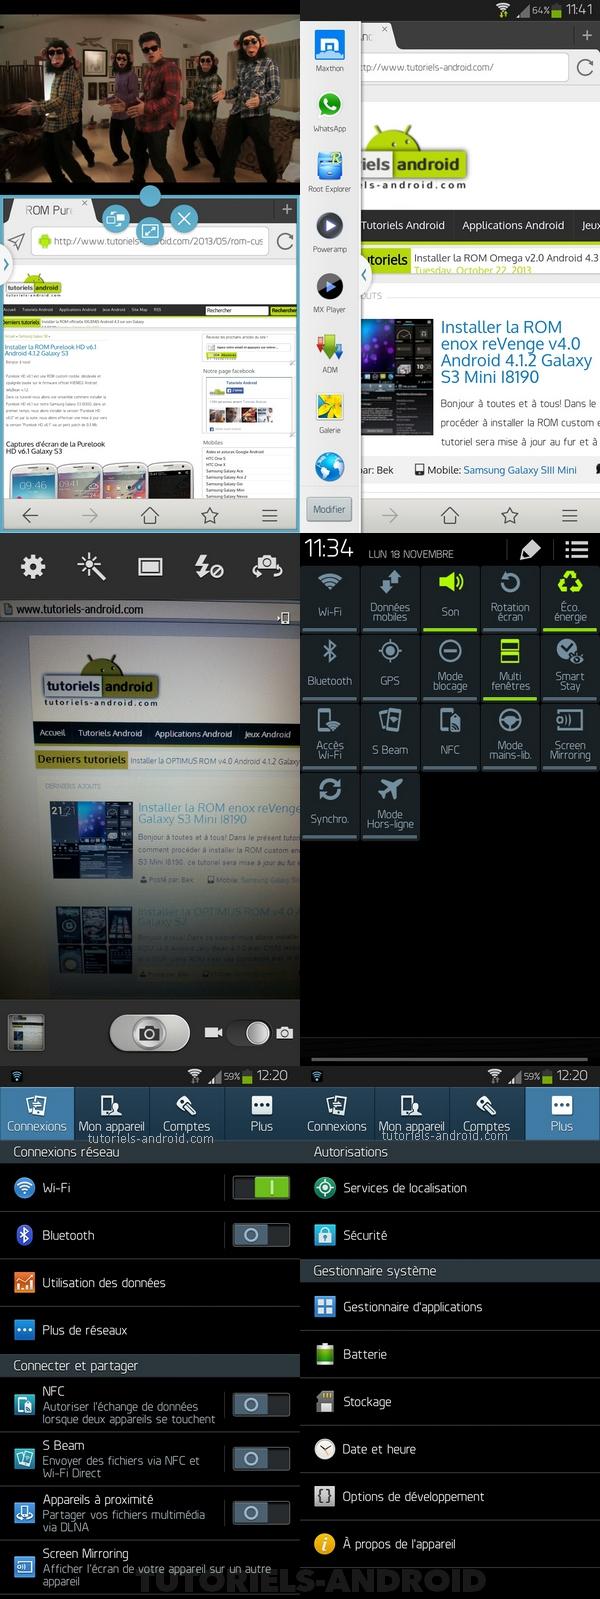 Captures : I9300XXUGMJ9 Android 4.3